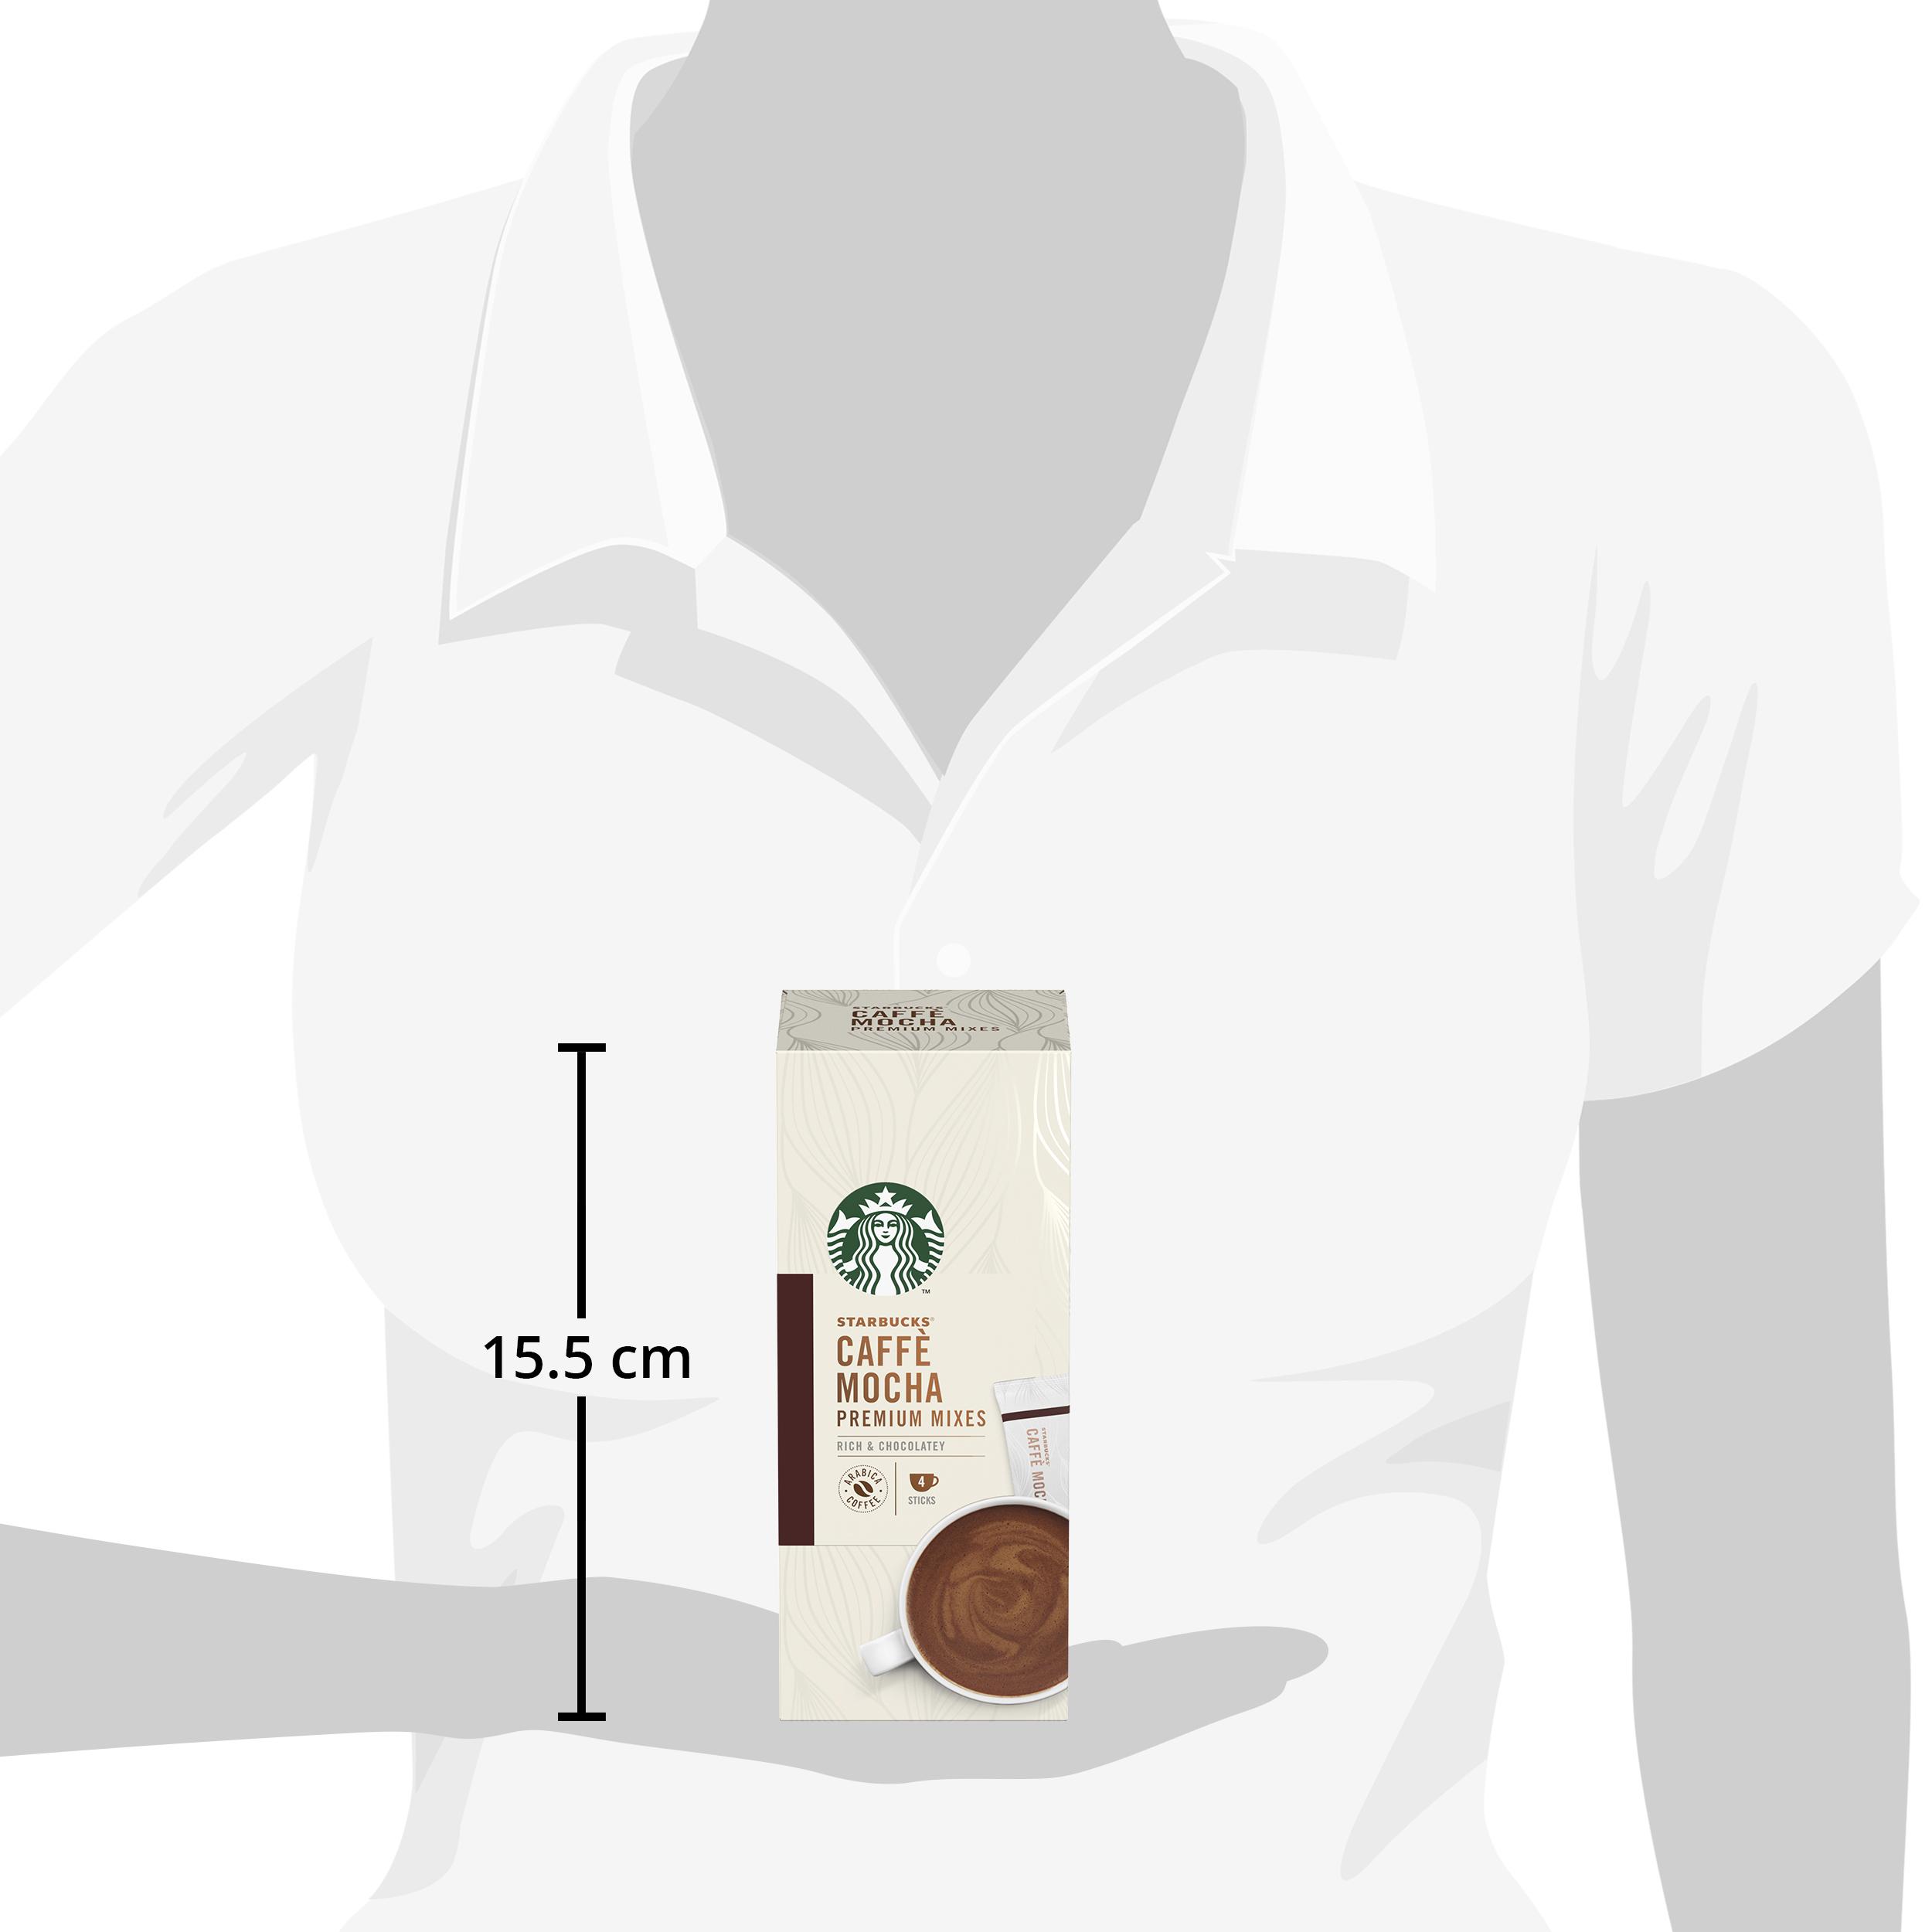 STARBUCKS® Caffè Mocha Premium Instant Coffee Mixes (4 Sticks/Box), Bundle of 2 ExpDate:DEC20